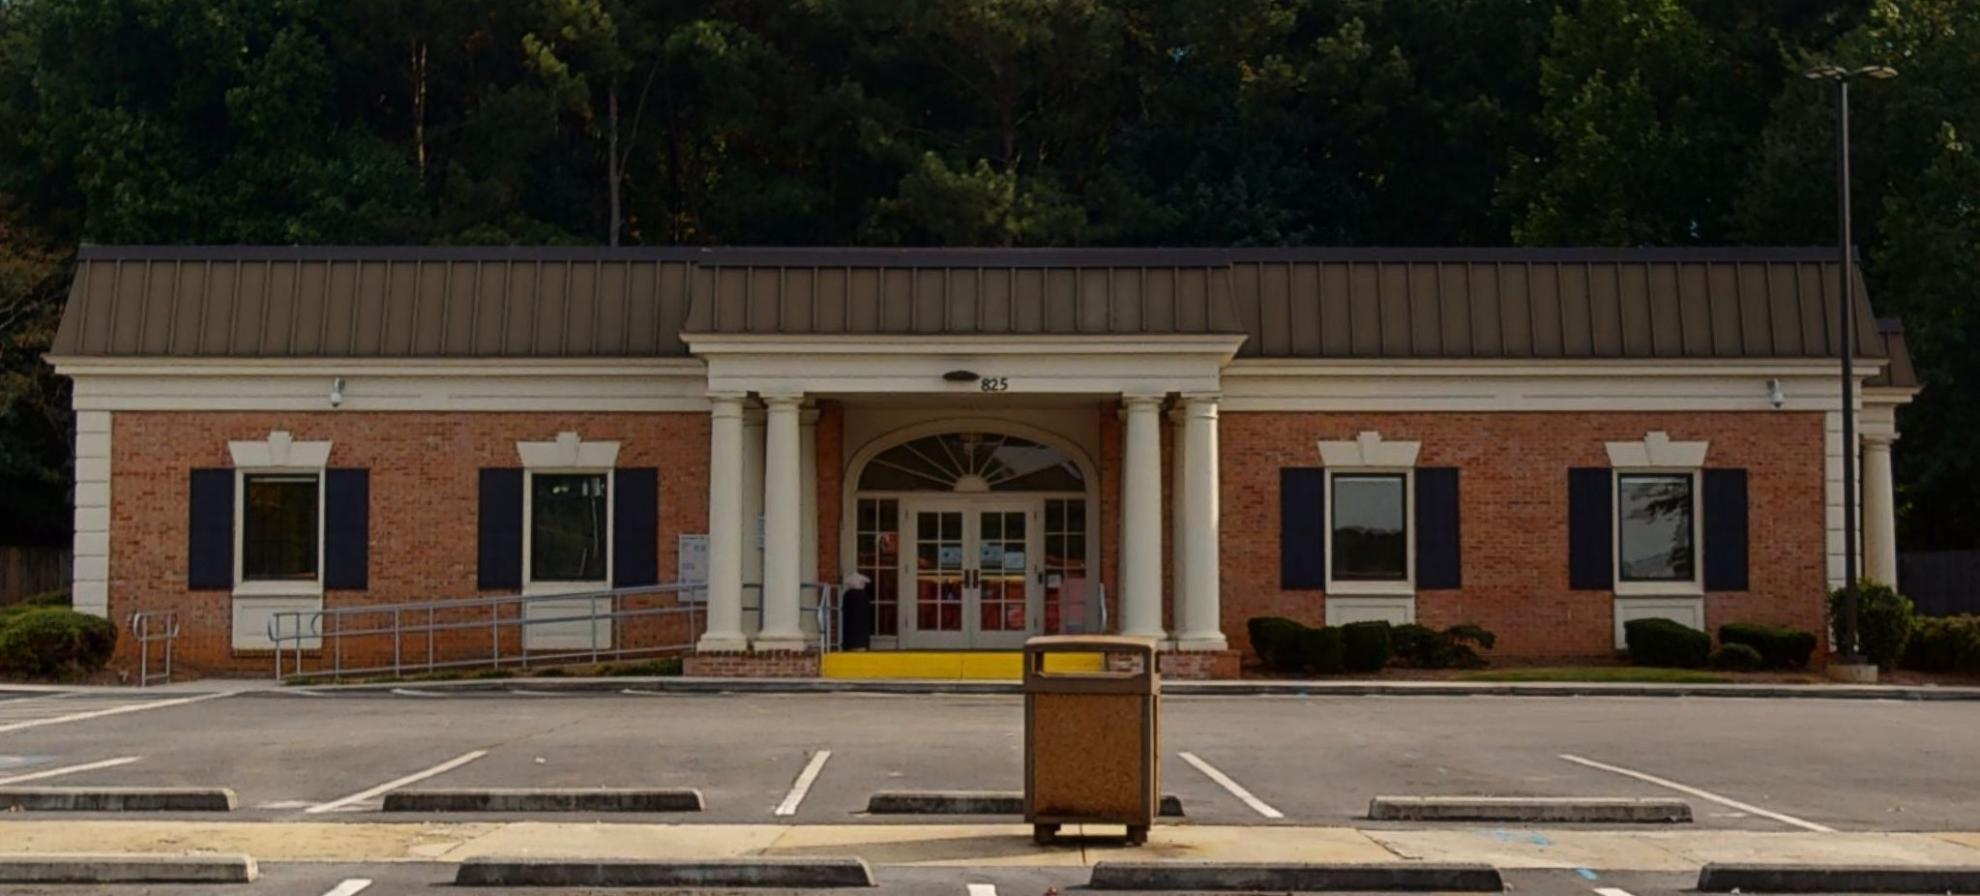 Bank of America financial center with drive-thru ATM   825 Spur 138, Jonesboro, GA 30236